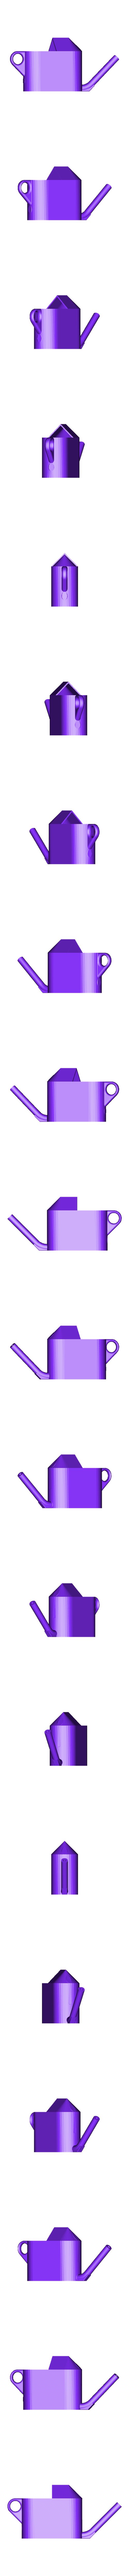 WateringCan_Done.STL Download free STL file Desktop Succulents Watering Can - 45 degree fix • 3D printable model, RobotDoctor